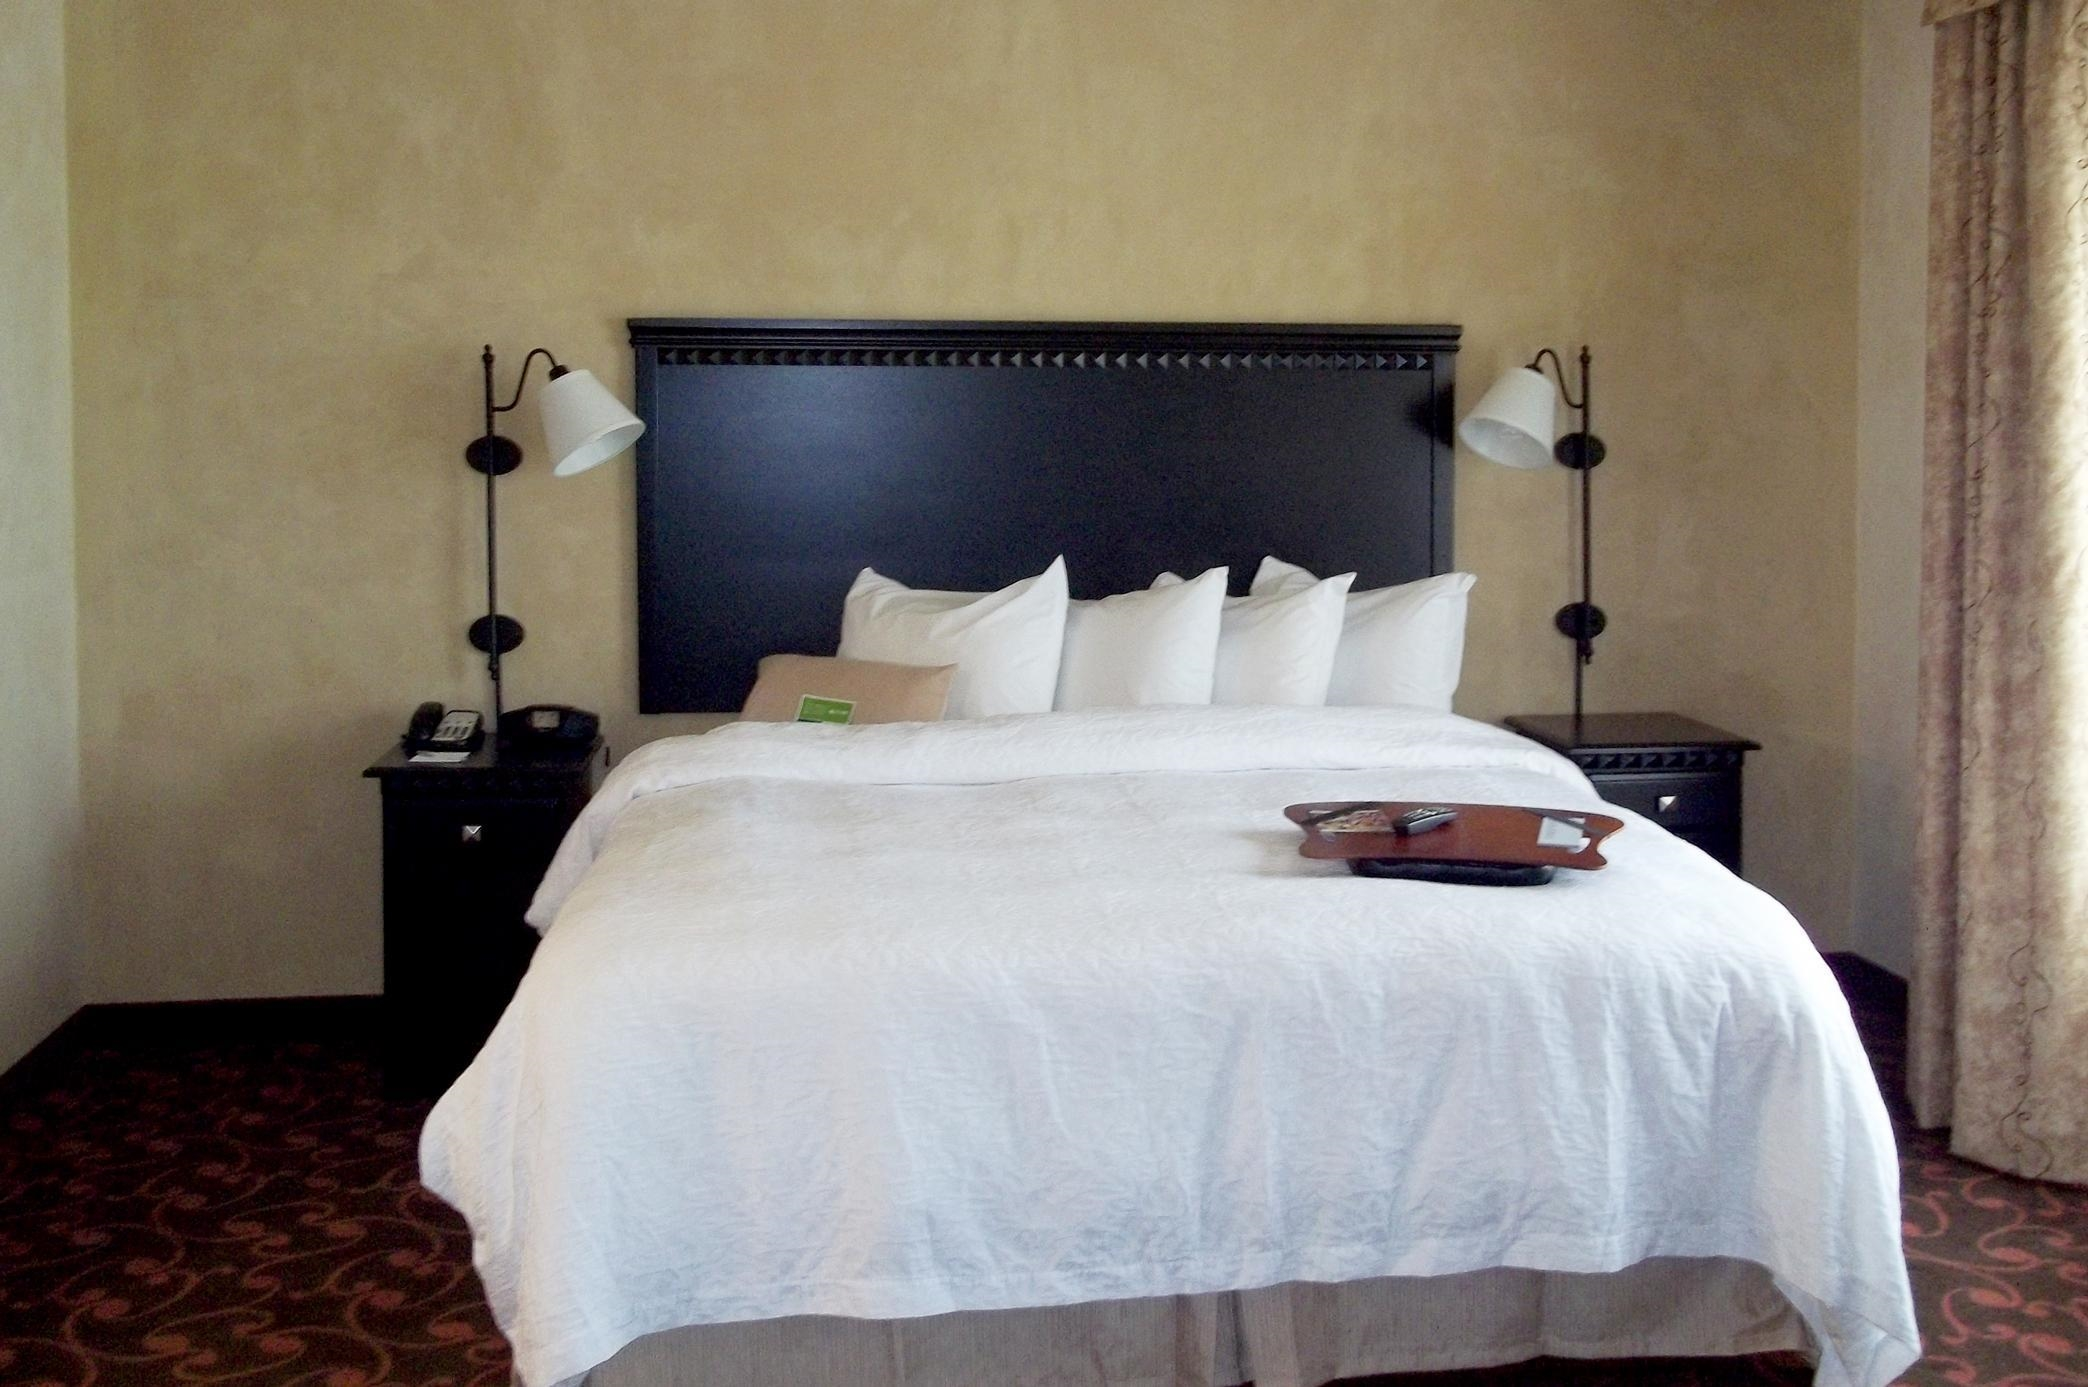 Hampton Inn & Suites Dallas-Arlington North-Entertainment District image 10